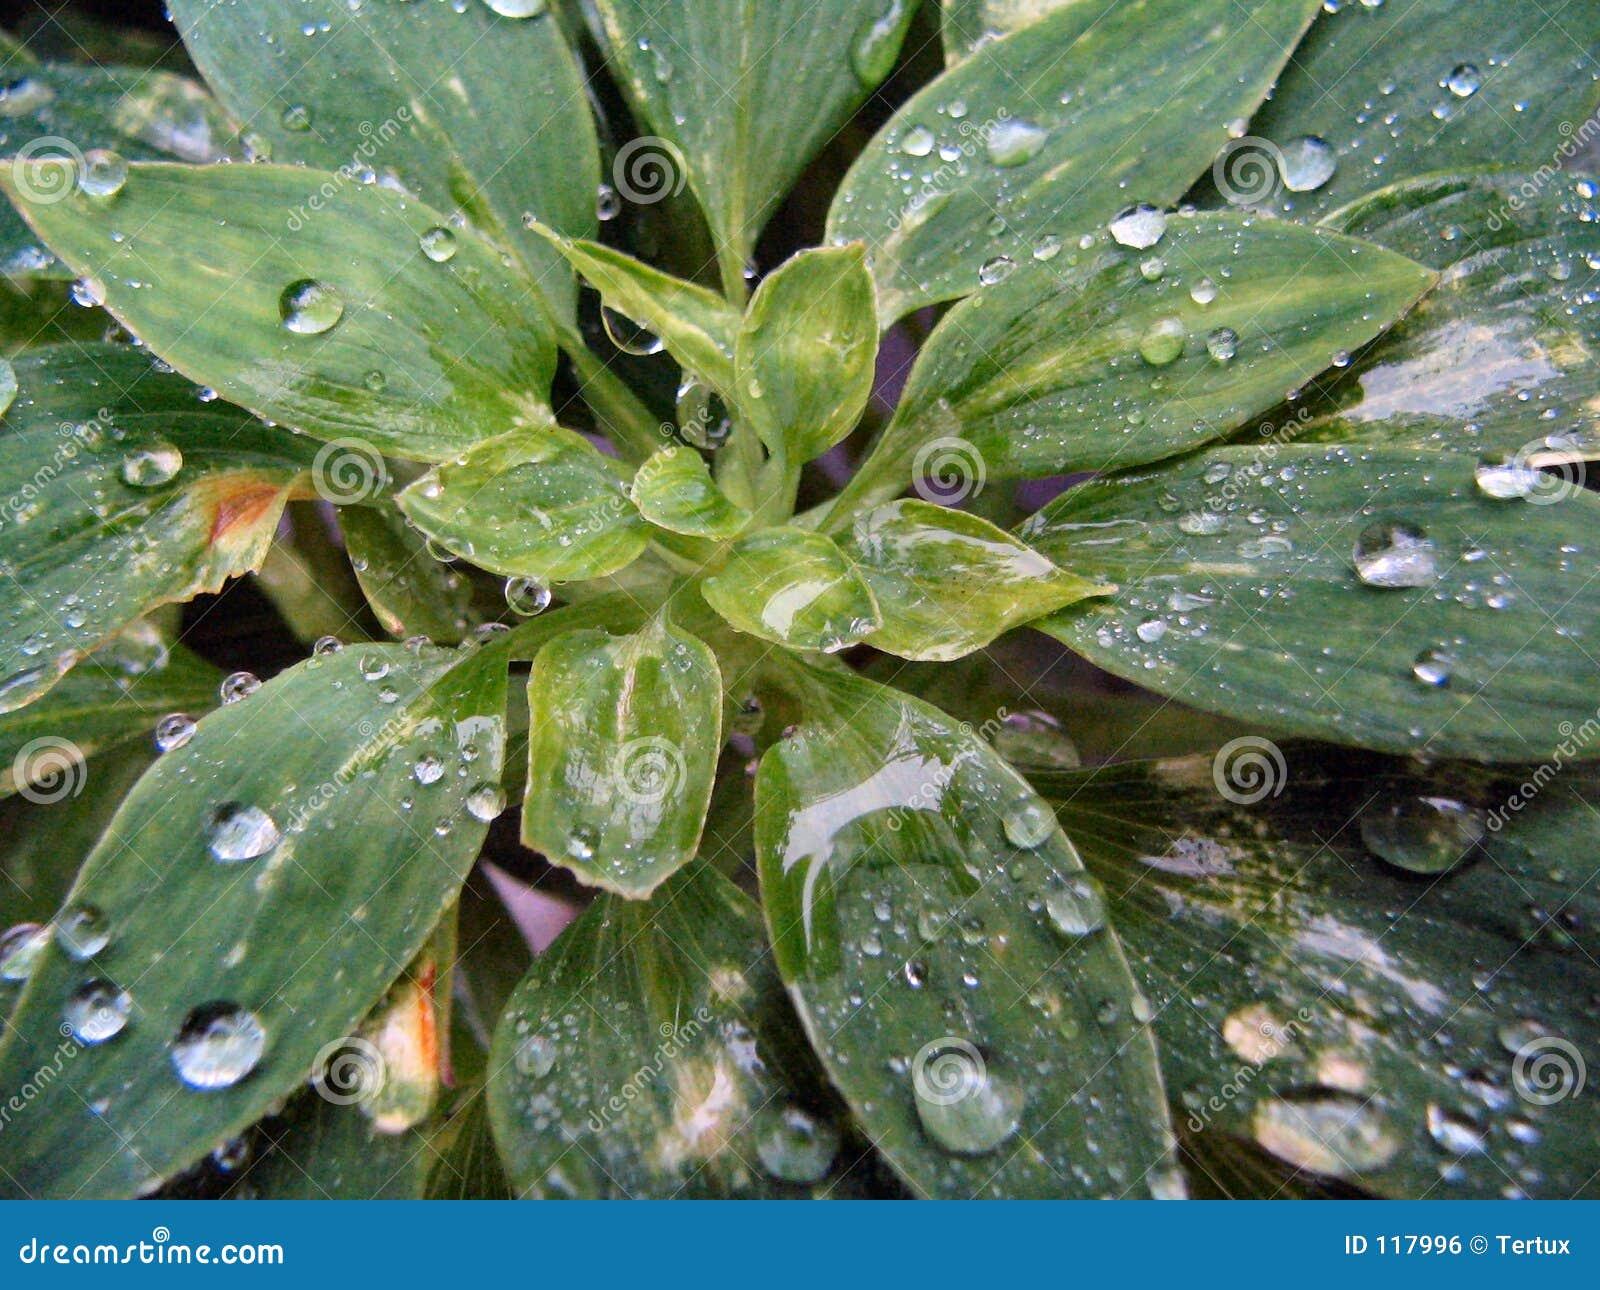 Tear drops on plant